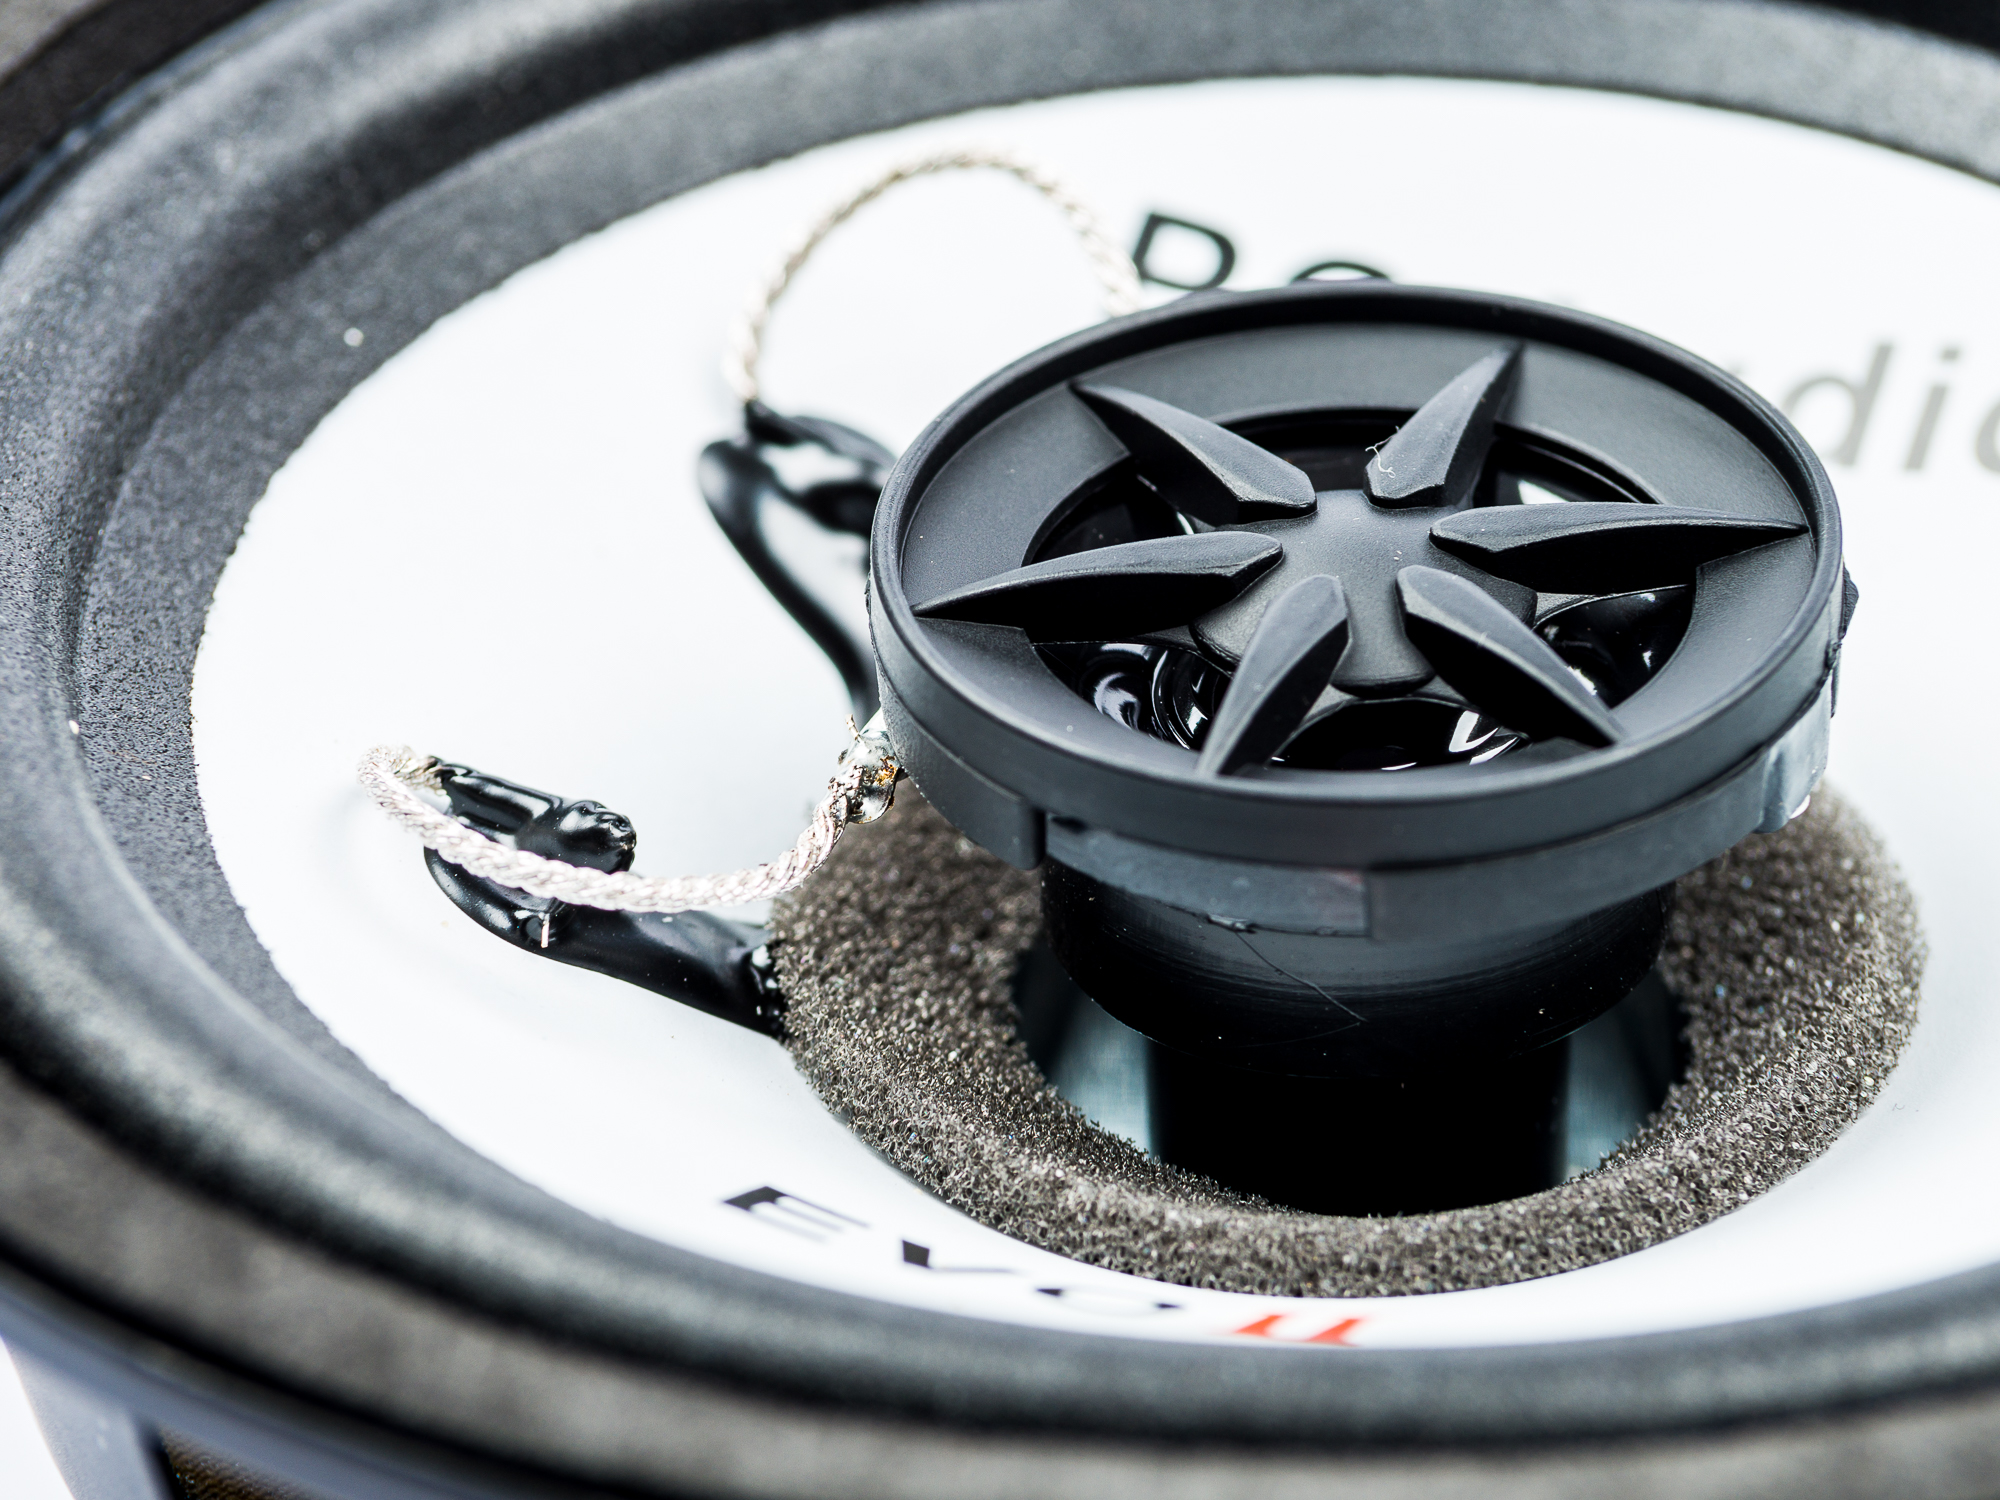 Citroen Jumpy Peugeot Expert Lautsprecher Einbauset Tür vorne PG Audio – Bild 4